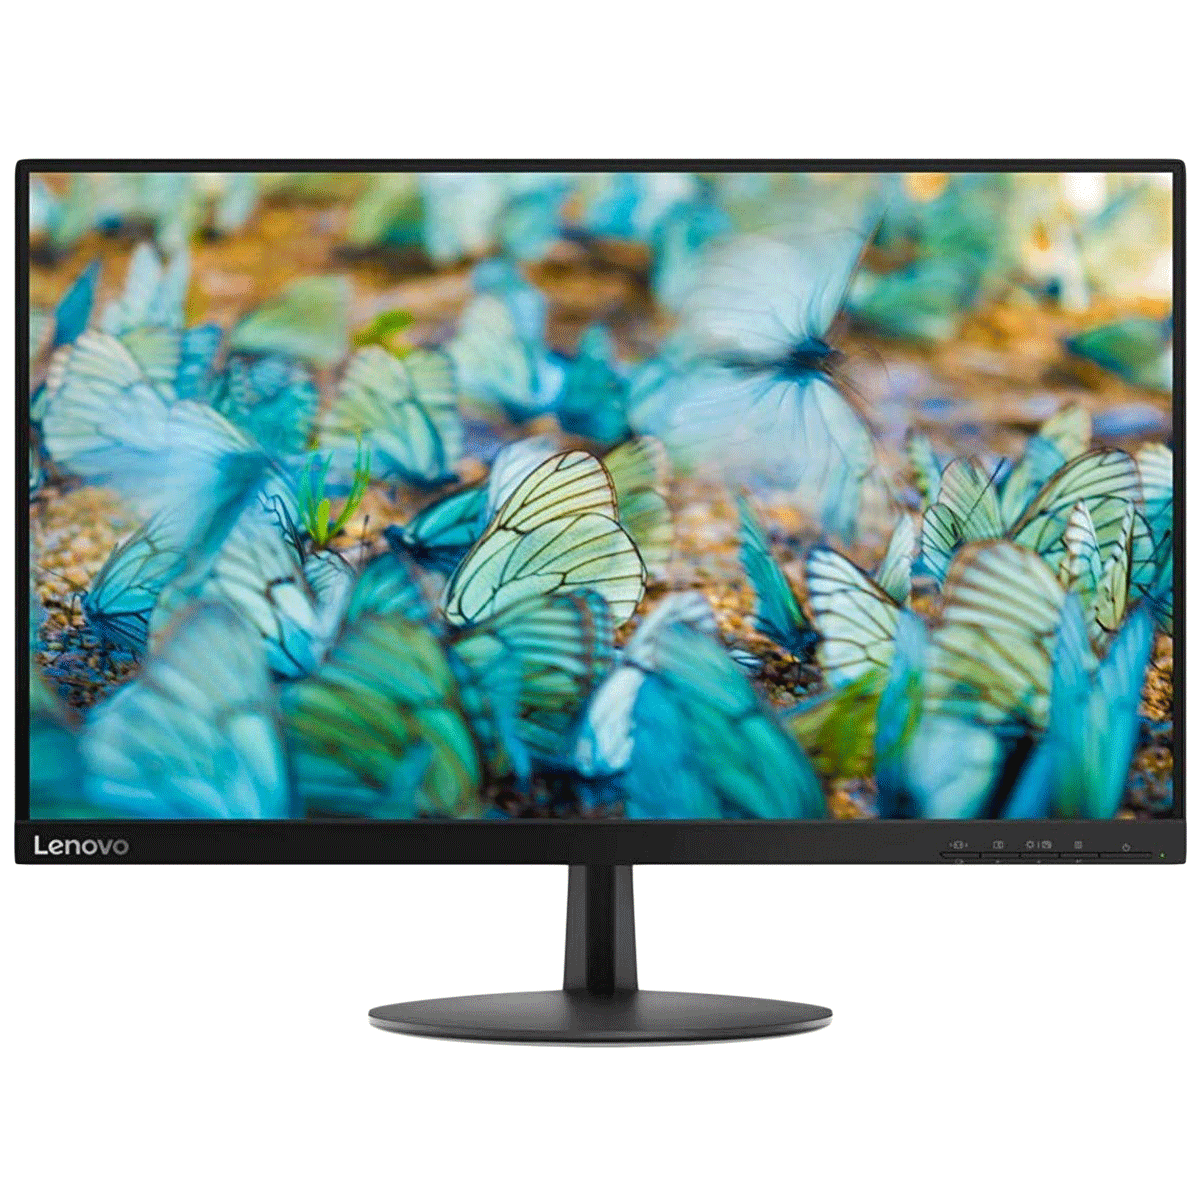 Lenovo L24e-20 60.45cm (23.8 Inches) Full HD LED Backlit Monitor (Near-Edgeless Display, HDMI + VGA, 60 Hz, 65DFKAC1IN, Raven Black)